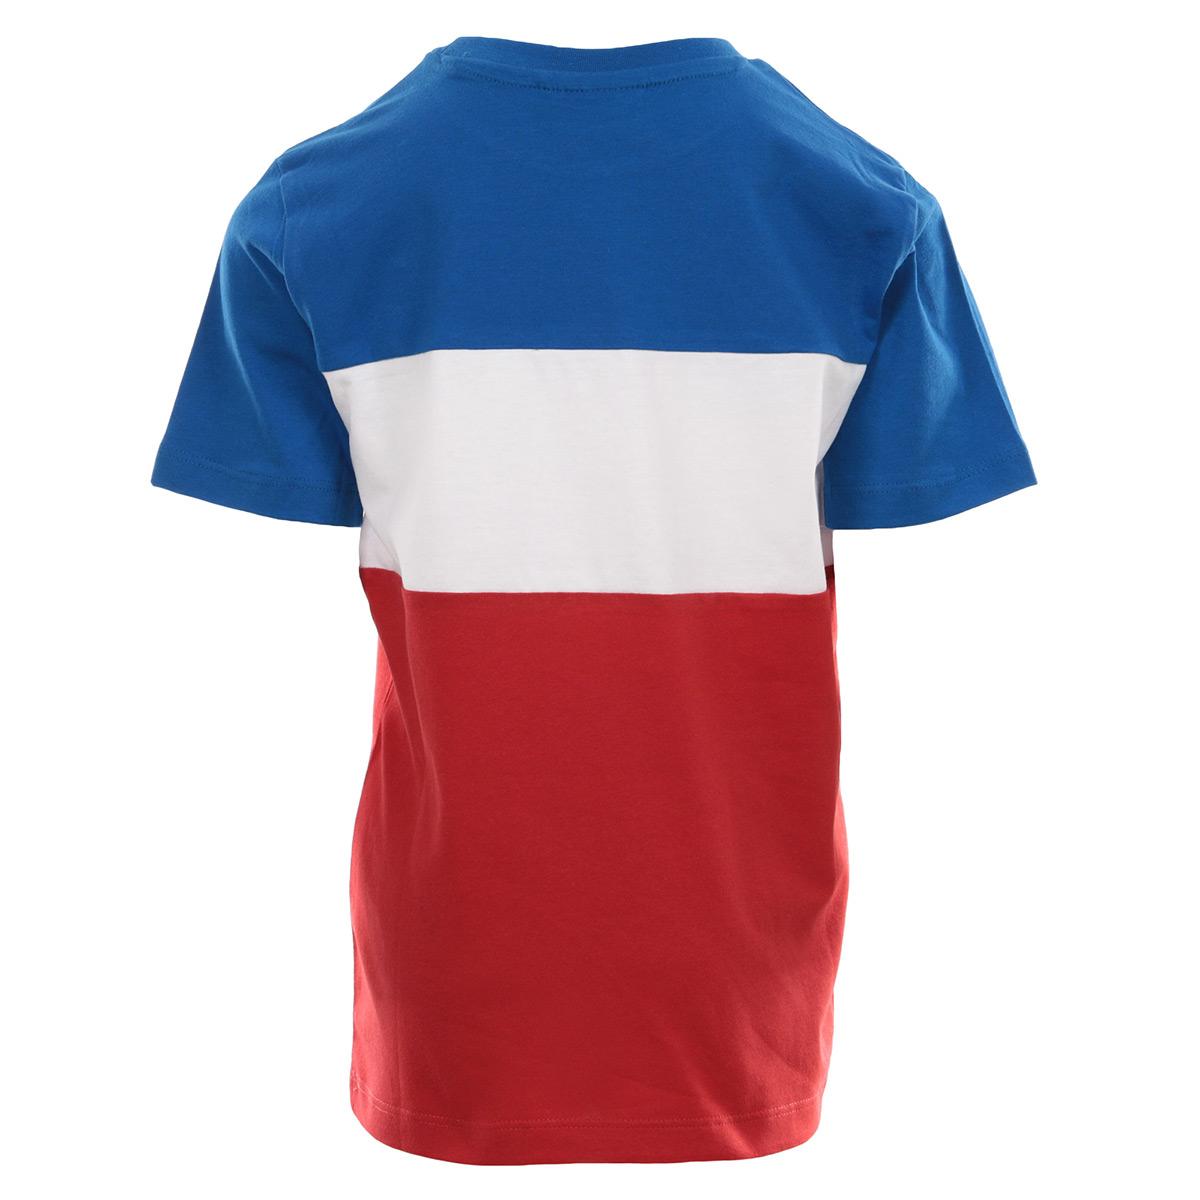 097dea098 Fila Kids Classic Day Blocked Tee 687192A130, T-Shirts